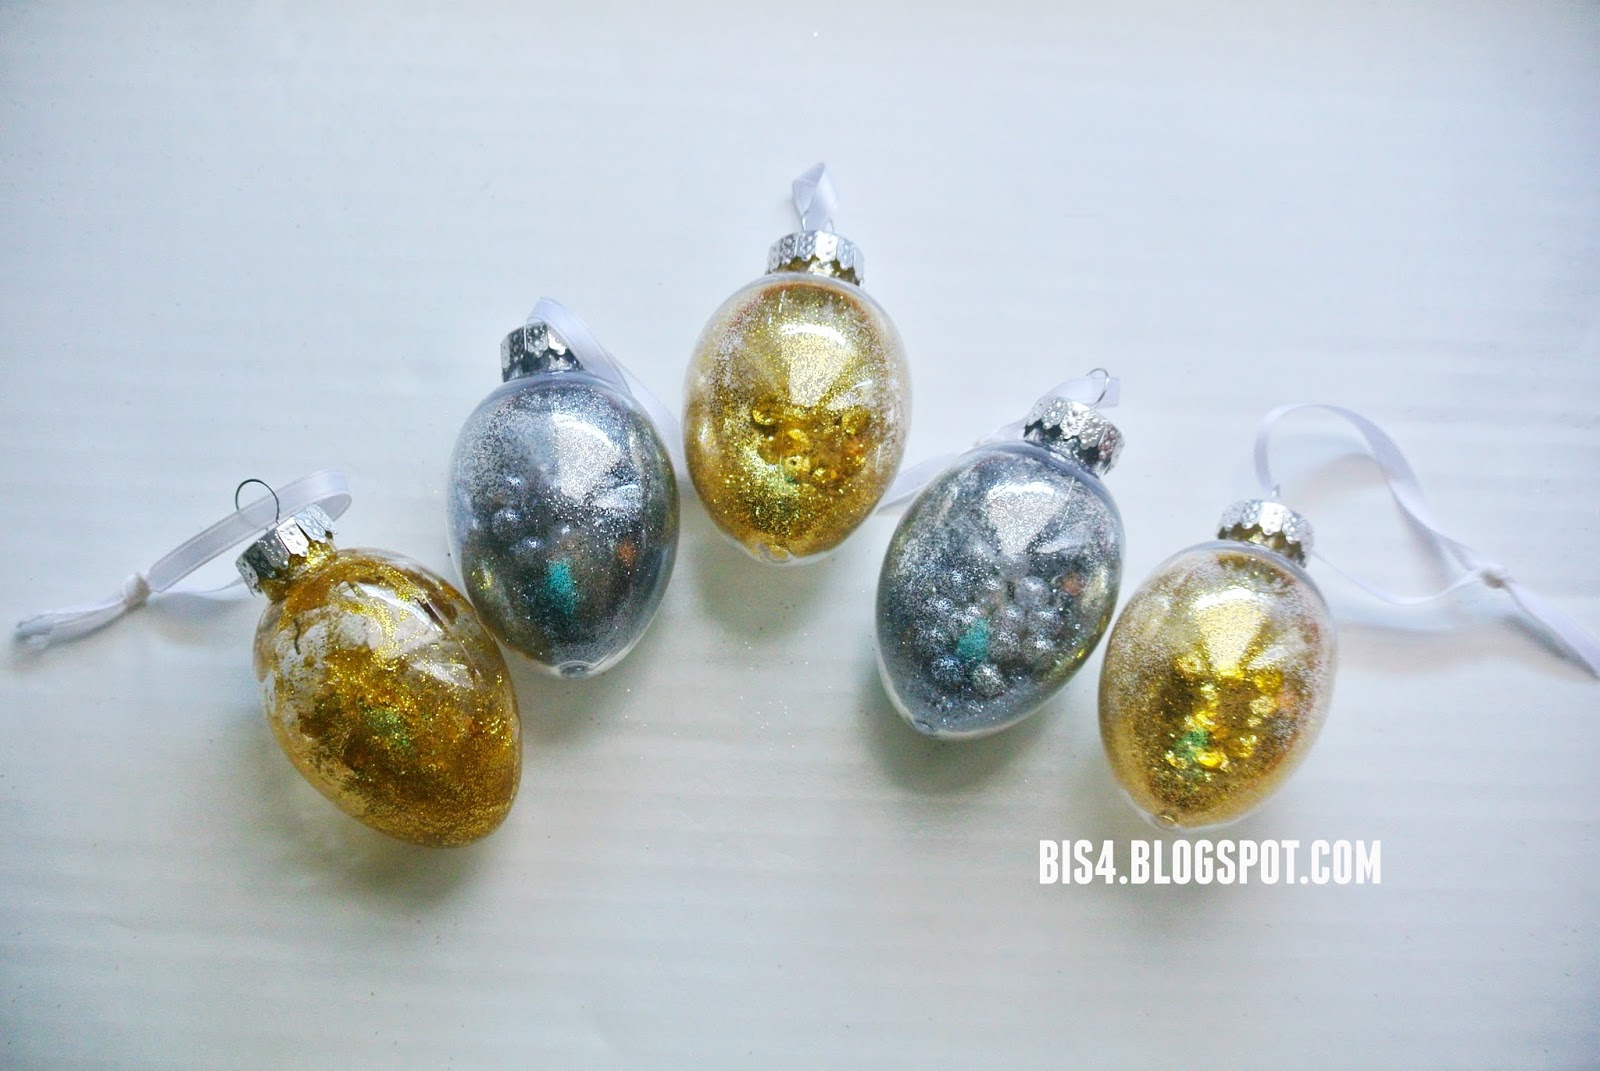 Light bulb ornaments - Diy Holiday Light Bulb Ornaments